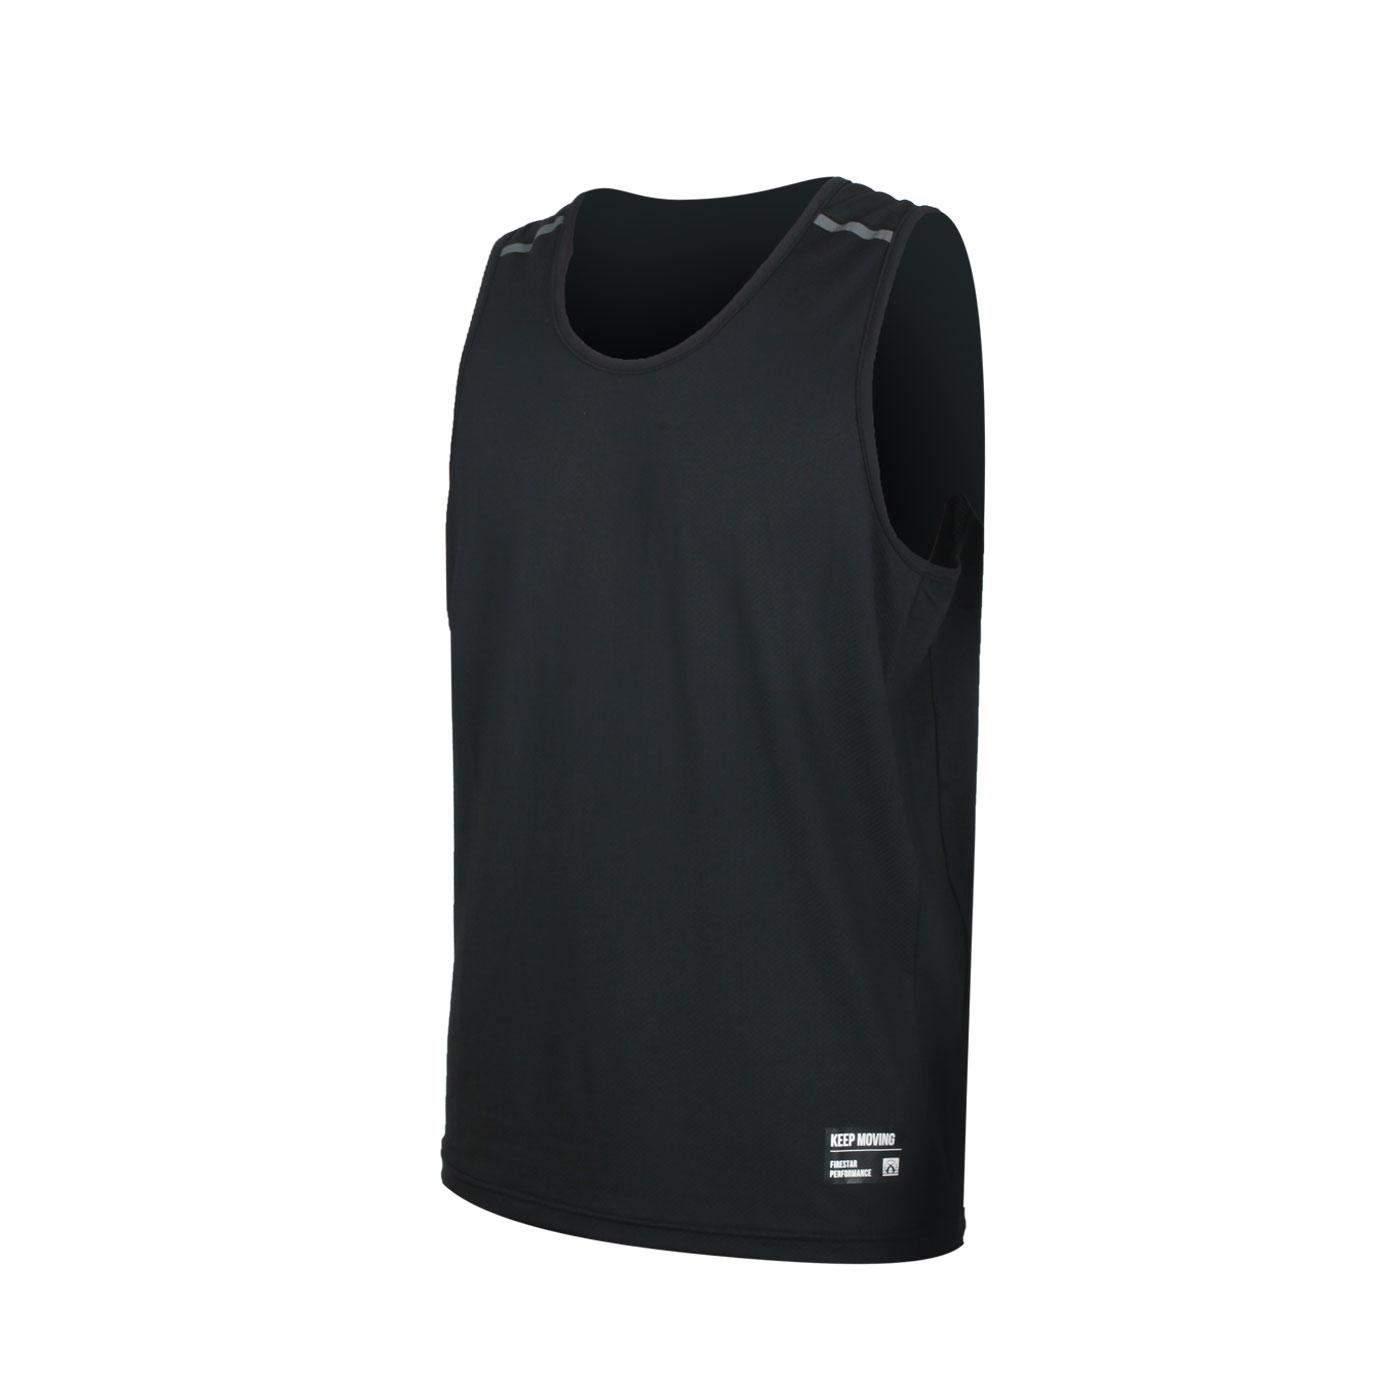 FIRESTAR 男款彈性訓練籃球背心 B0508-10 - 黑